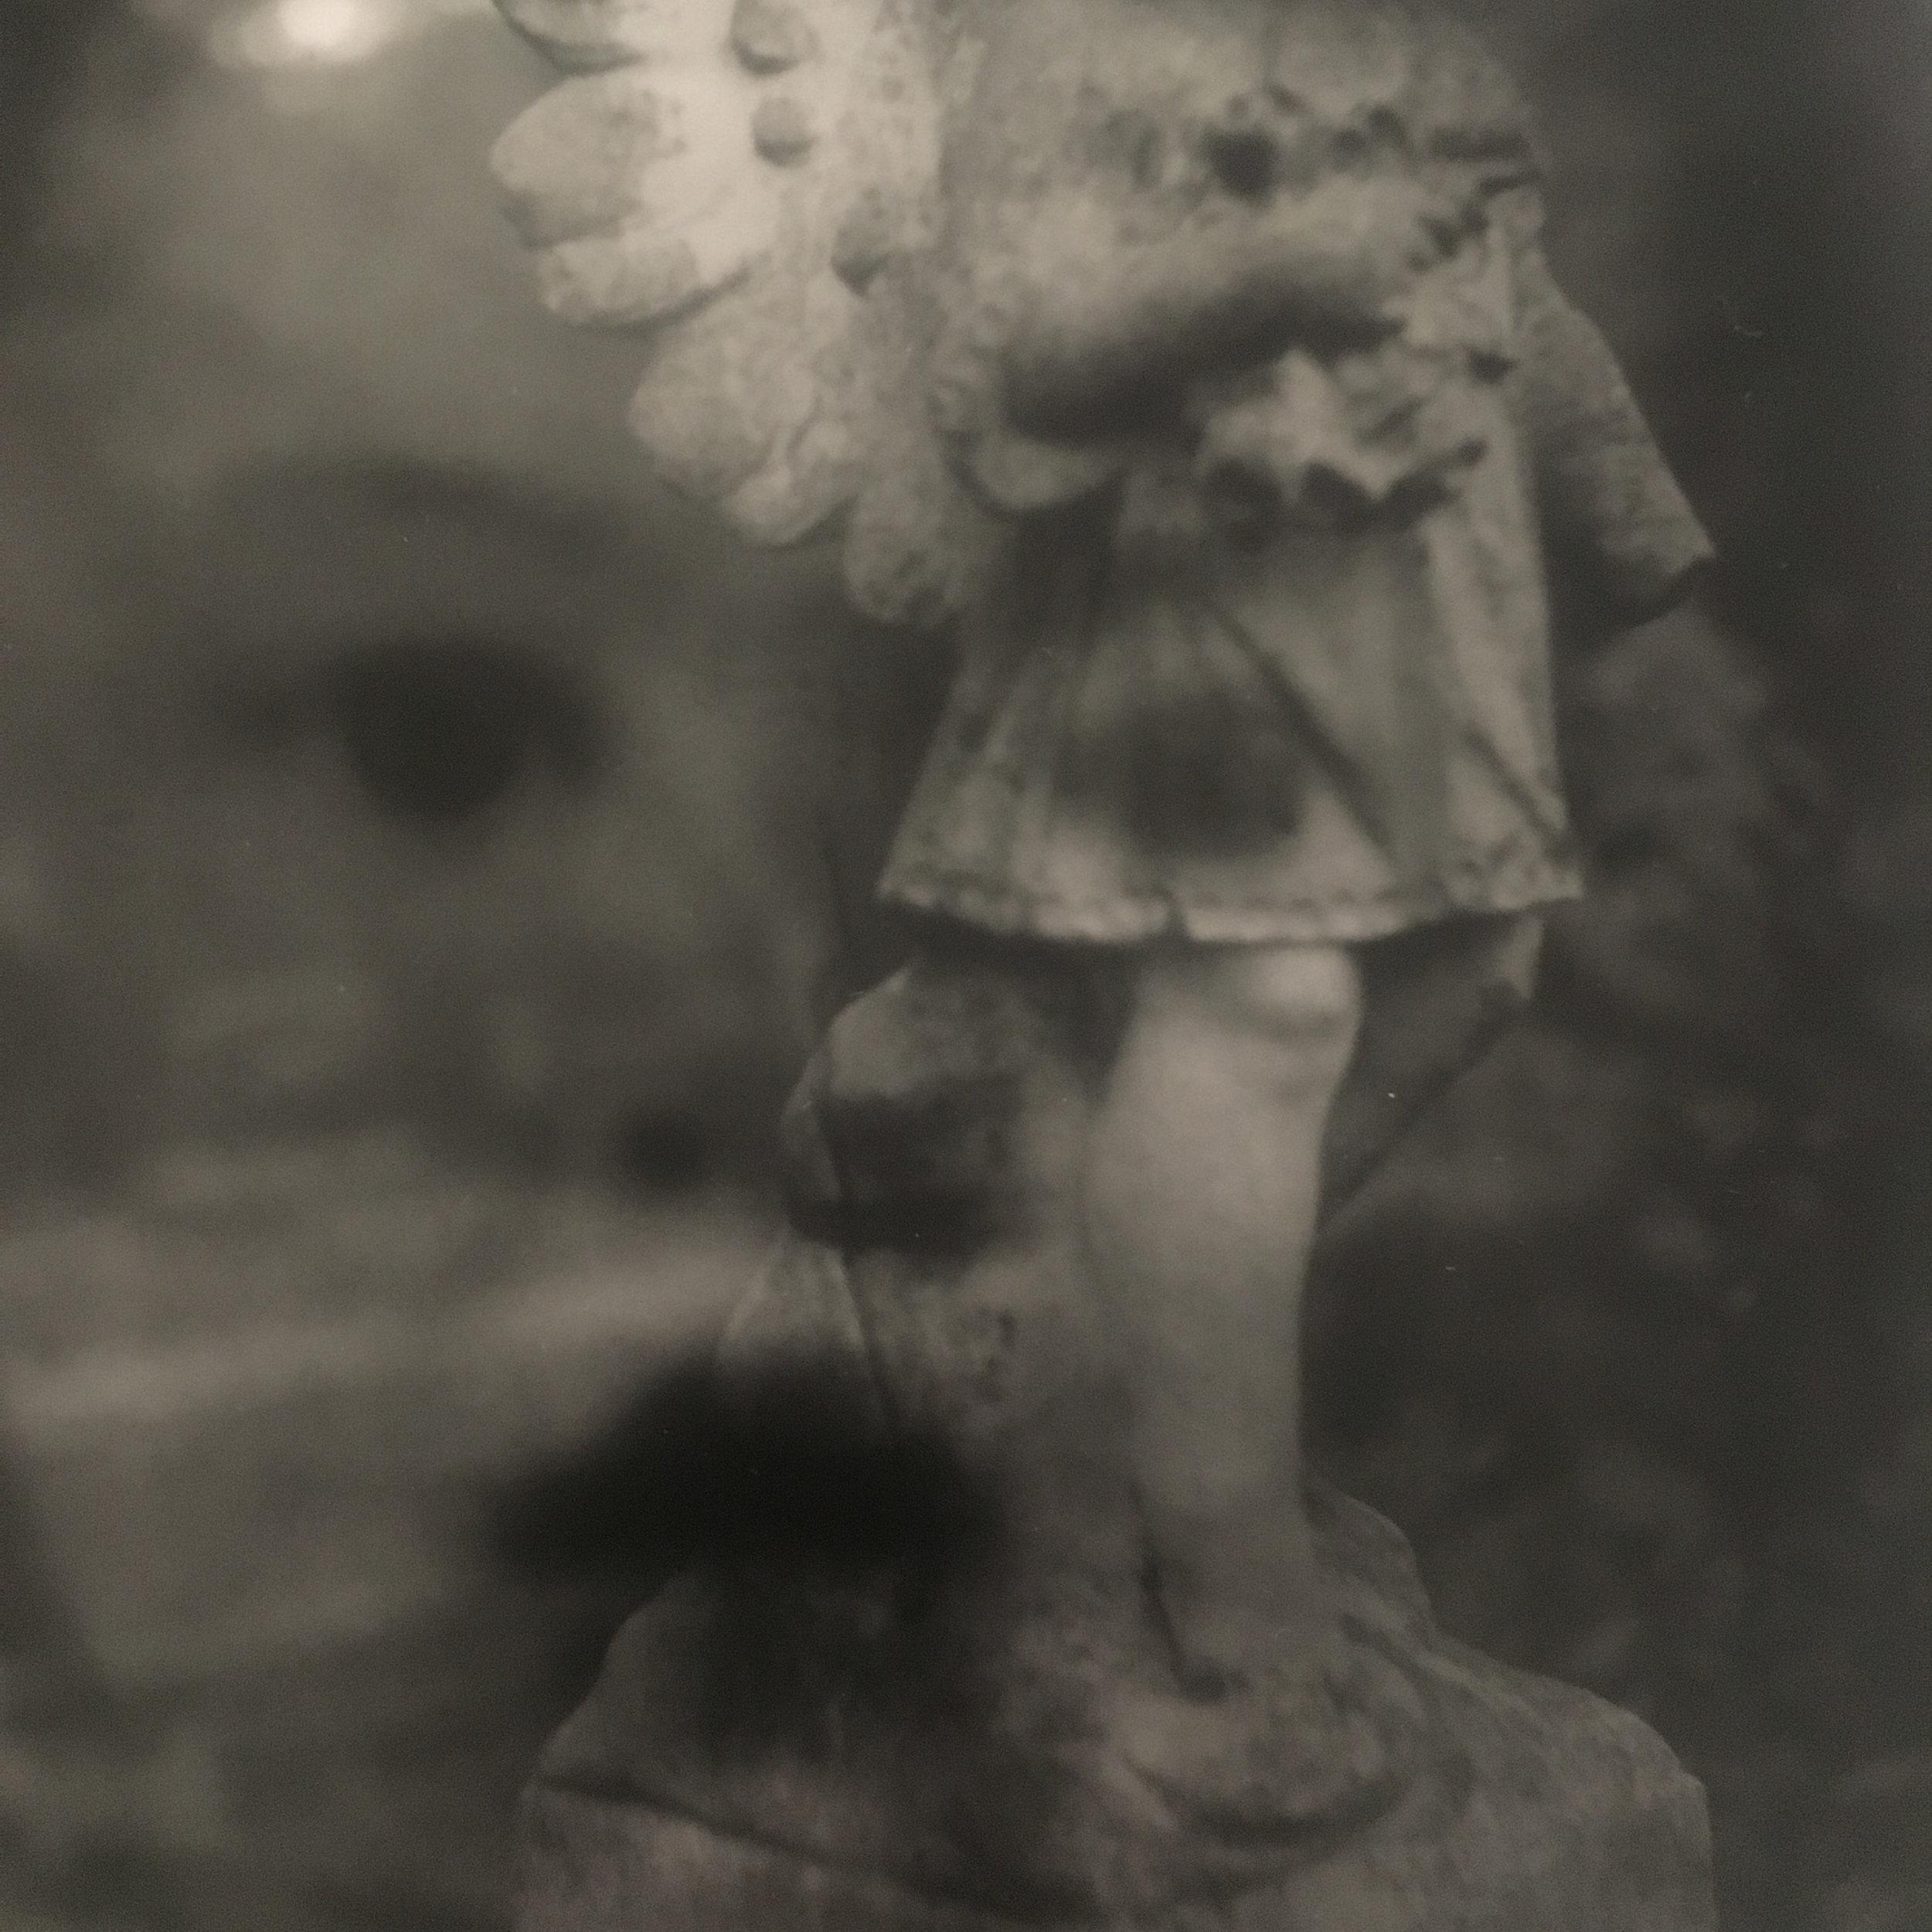 spiritphoto_series_scan-4.jpg